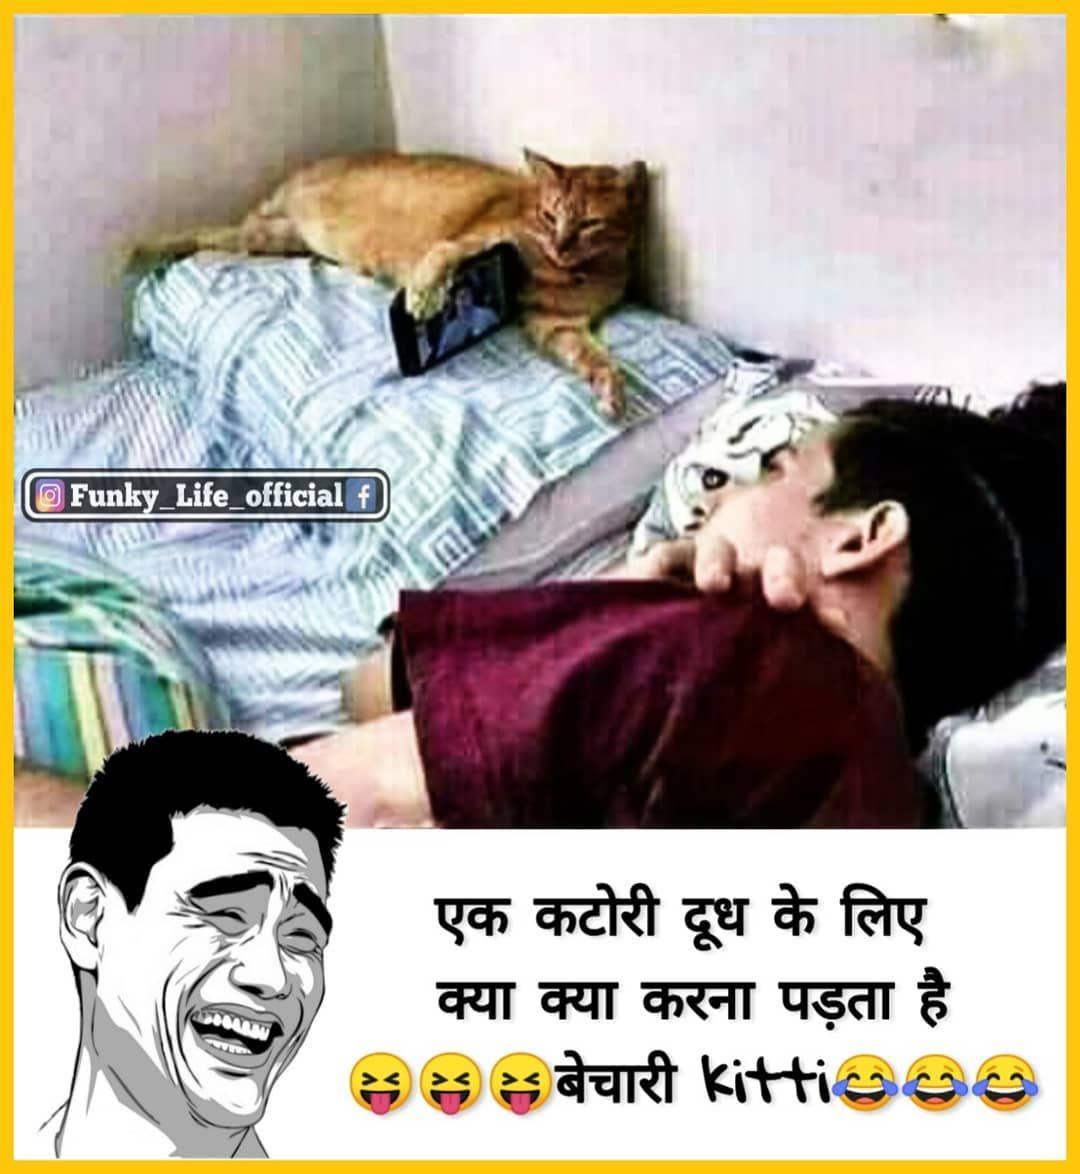 Pin By Estrella On Hindi Jokes Funny Love Jokes Cute Funny Quotes Funny Picture Jokes